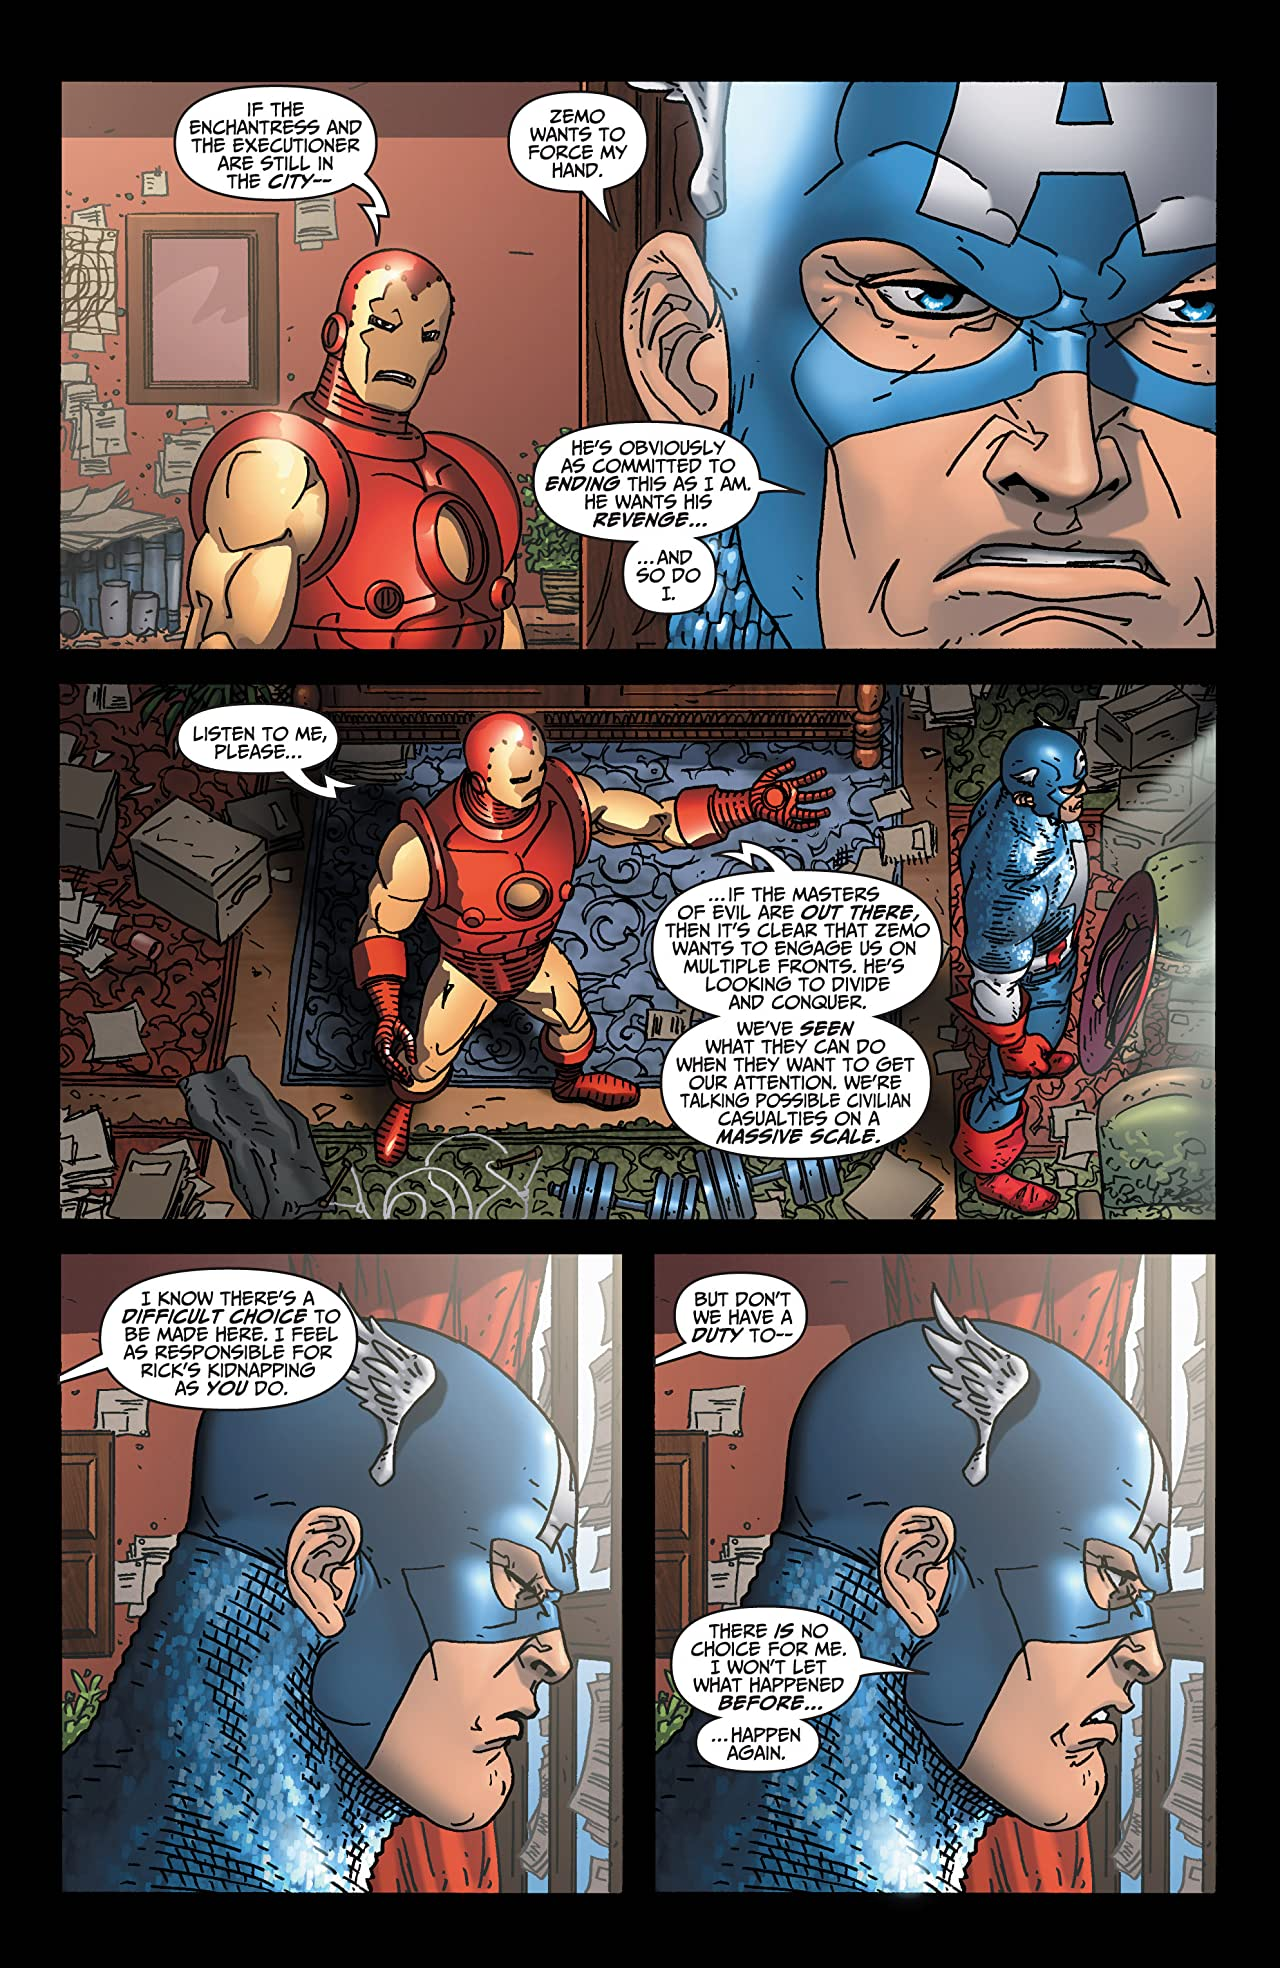 Avengers: Earth's Mightiest Heroes (2004-2005) #6 (of 8)